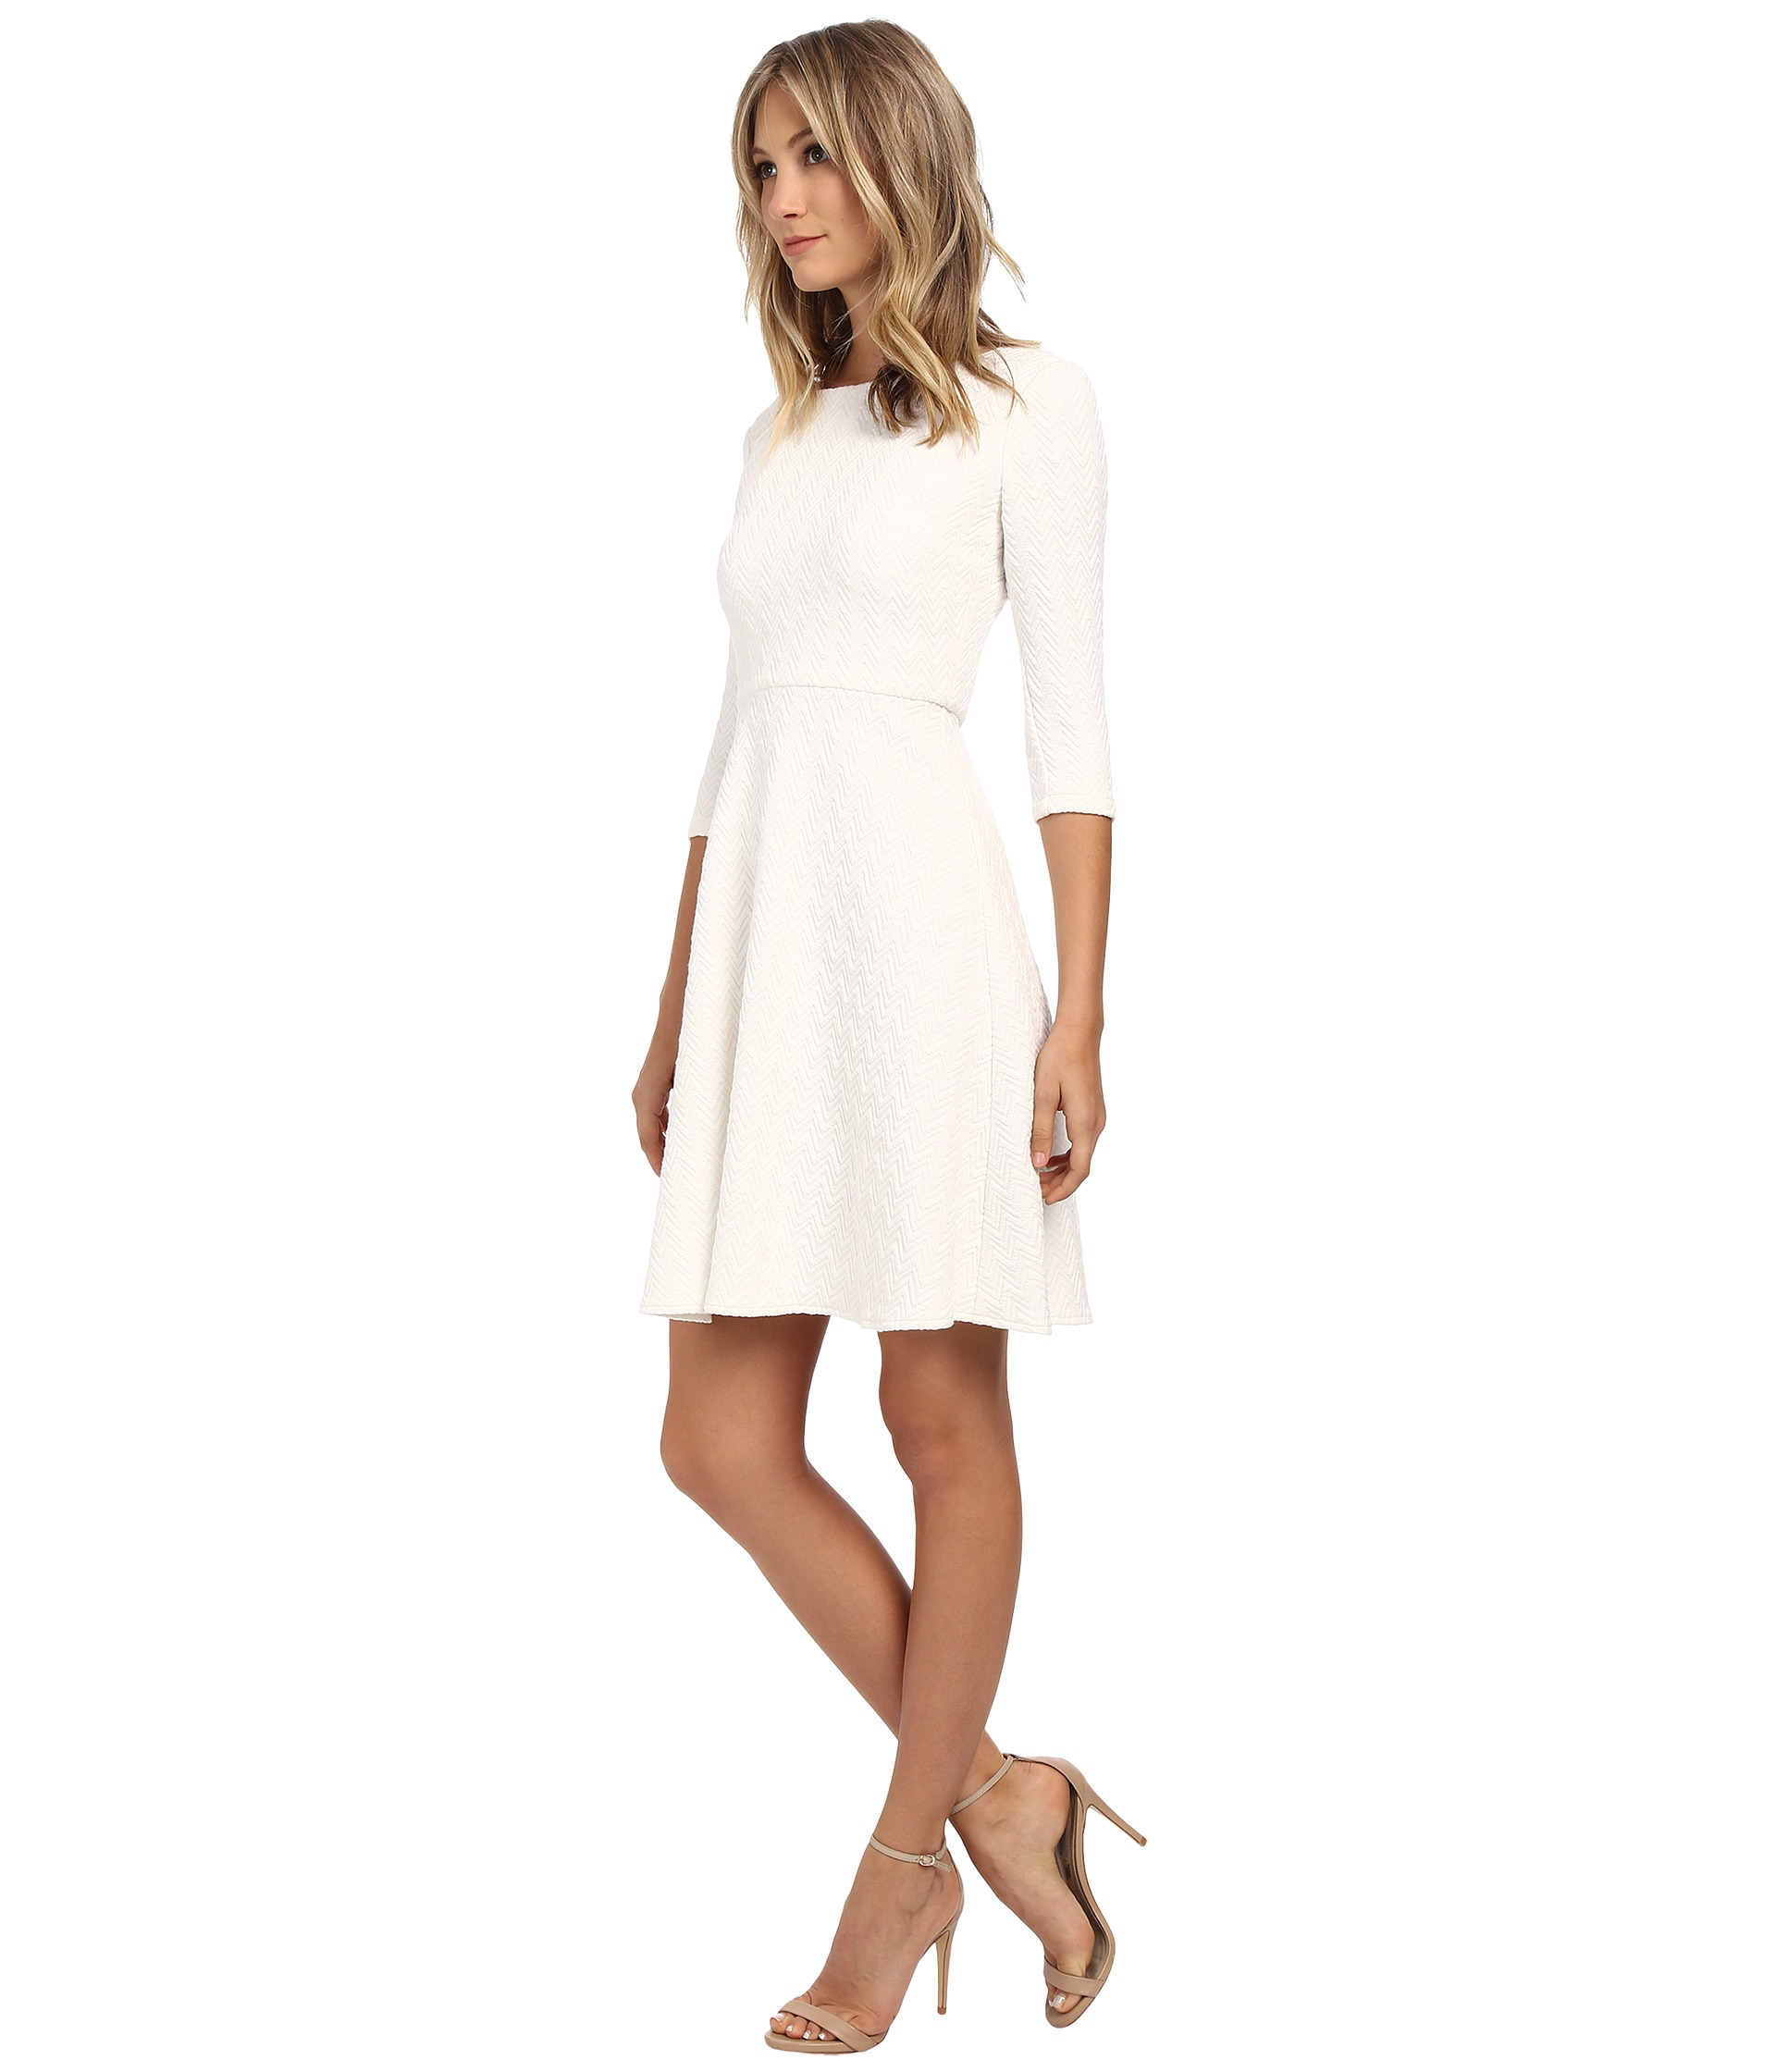 dd99b580018e82 Donna Morgan 3/4 Sleeve Chevon Knit Fit & Flare Dress in Pink - Lyst